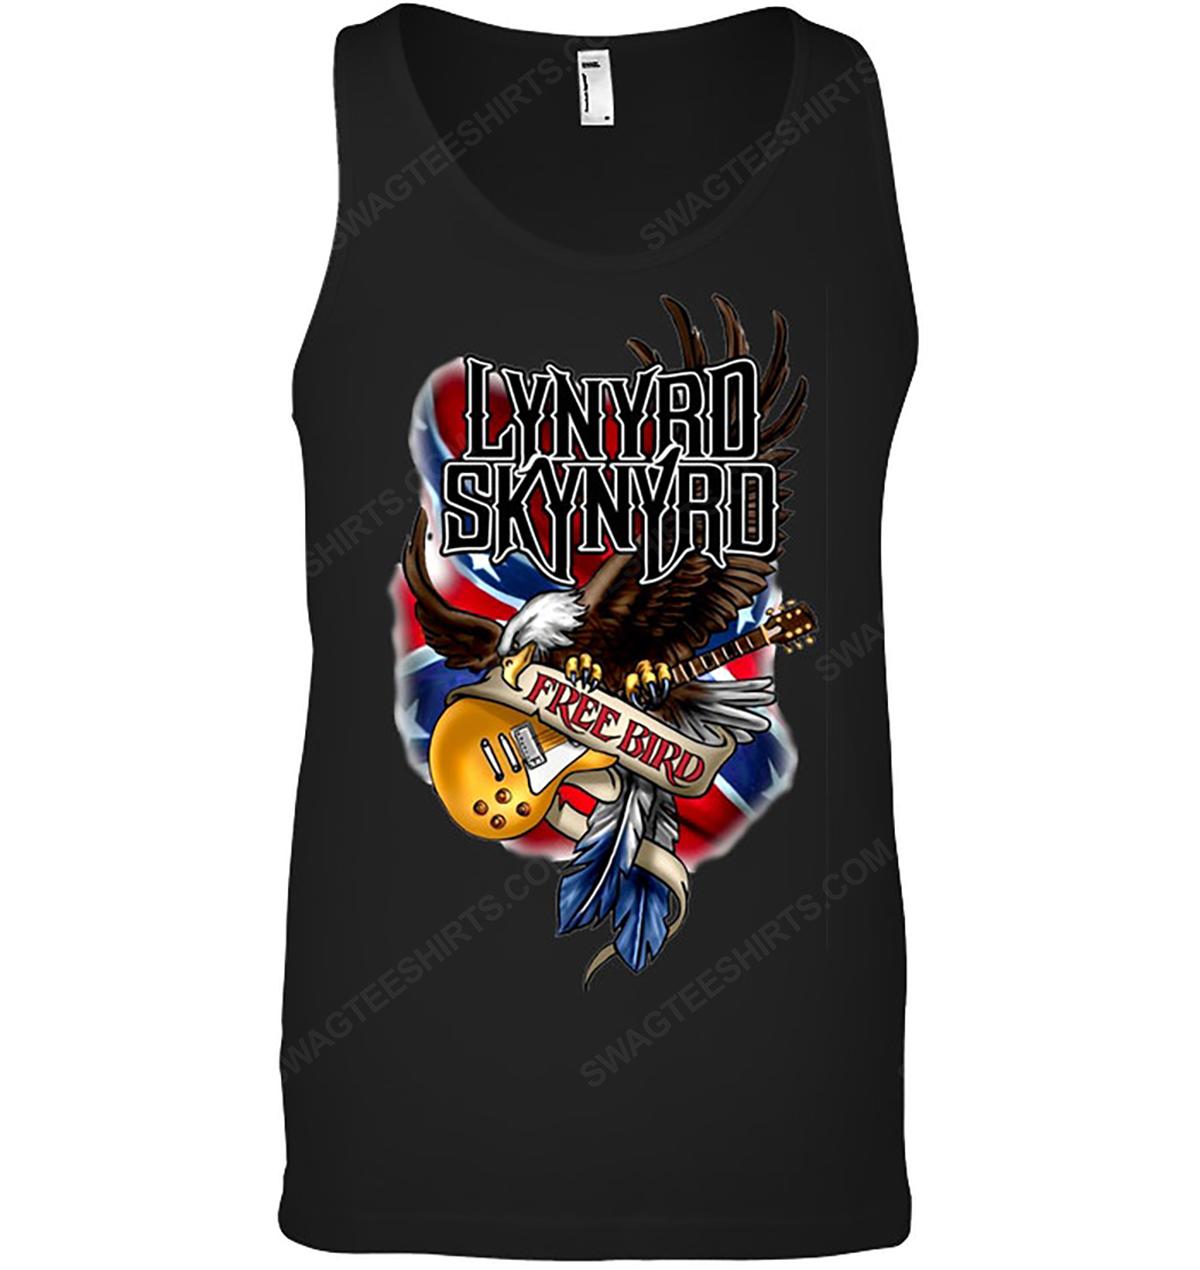 Rock band lynyrd skynyrd free bird tank top 1